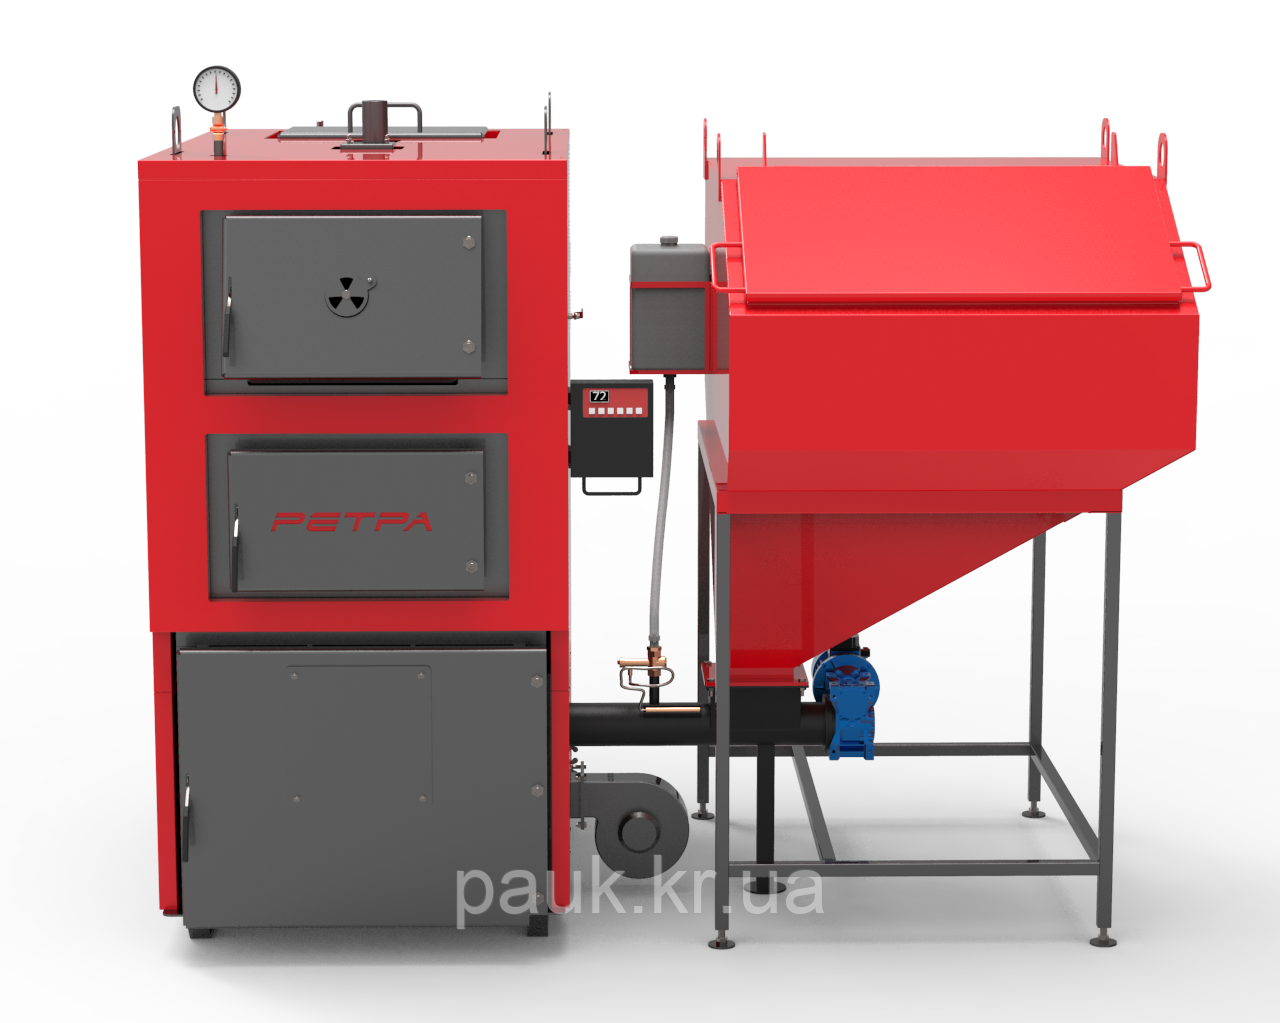 Котел РЕТРА-4МCombi-40 кВт з ретортним пальником твердопаливний сталевий